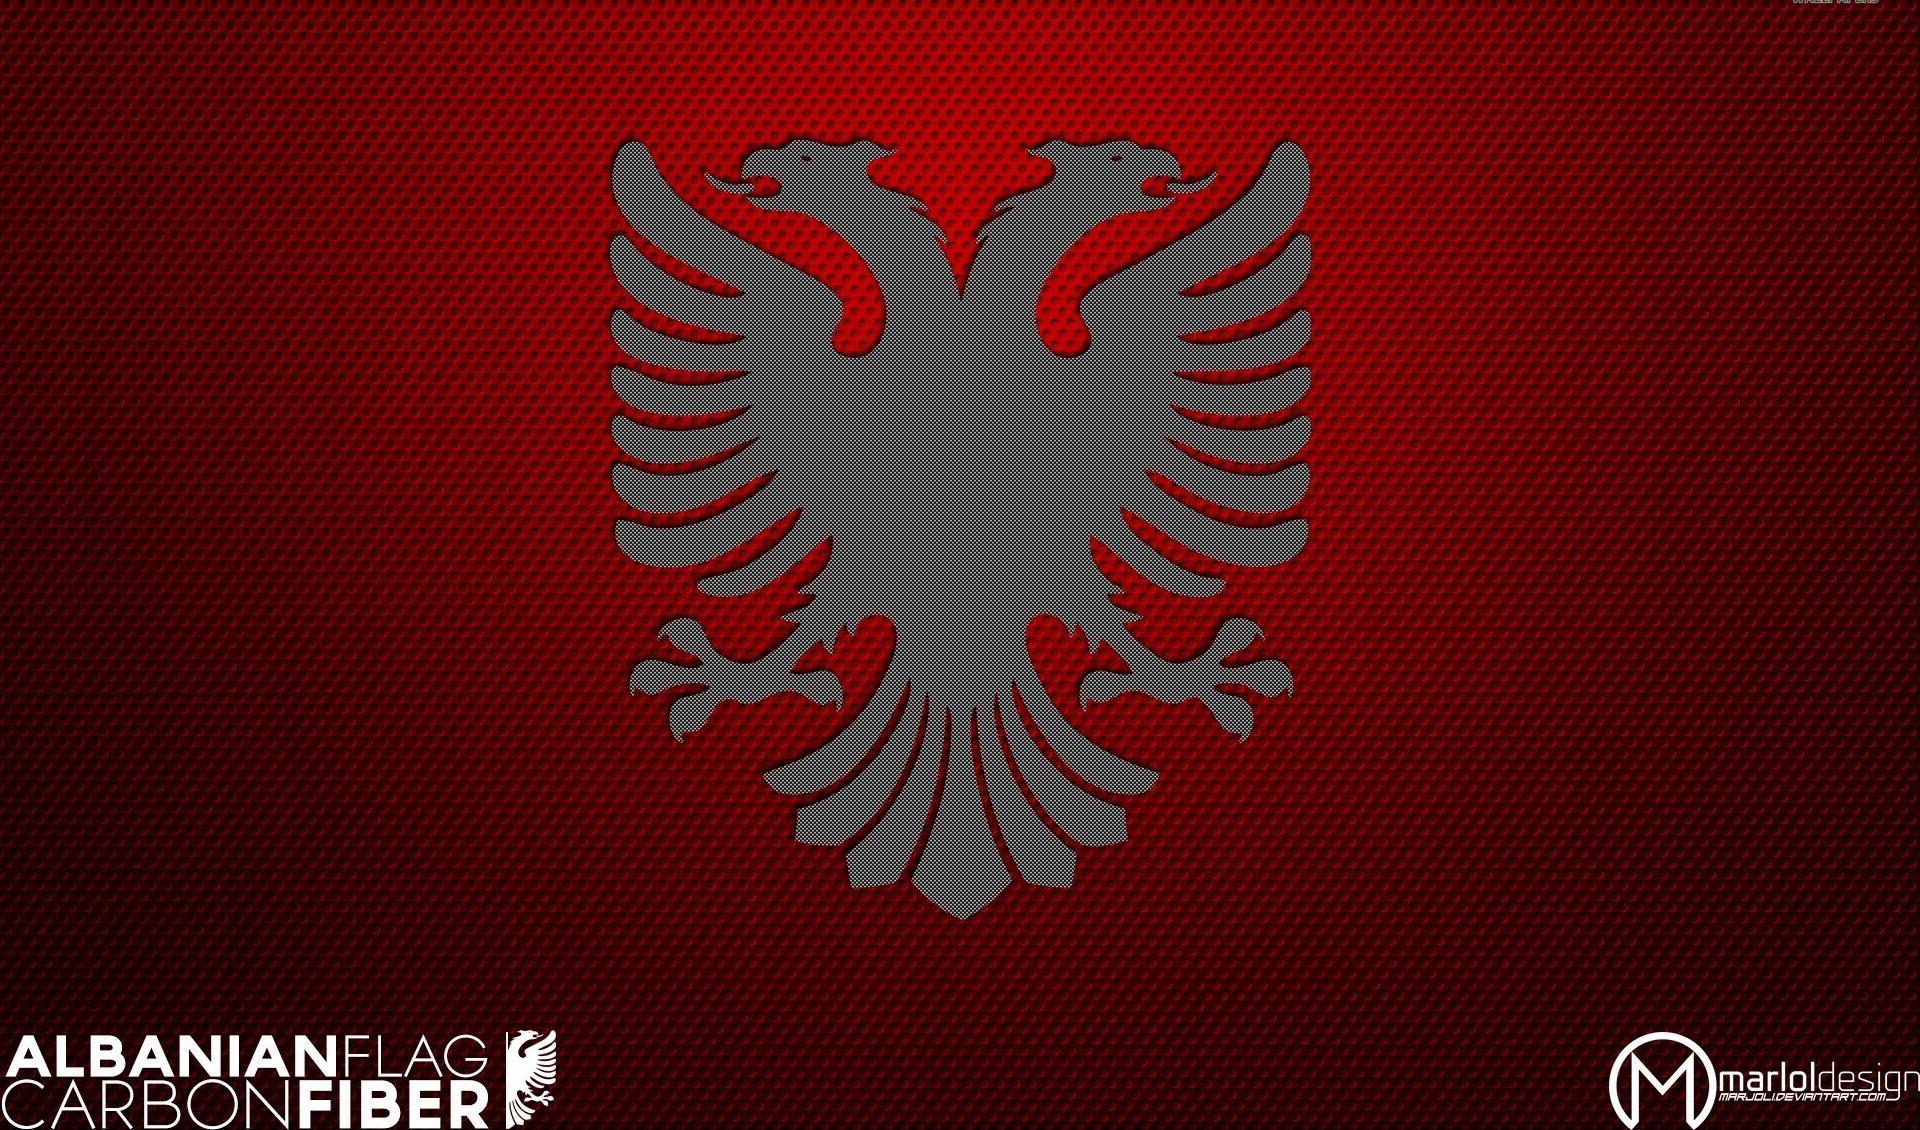 Albanian Flag wallpapers HD quality